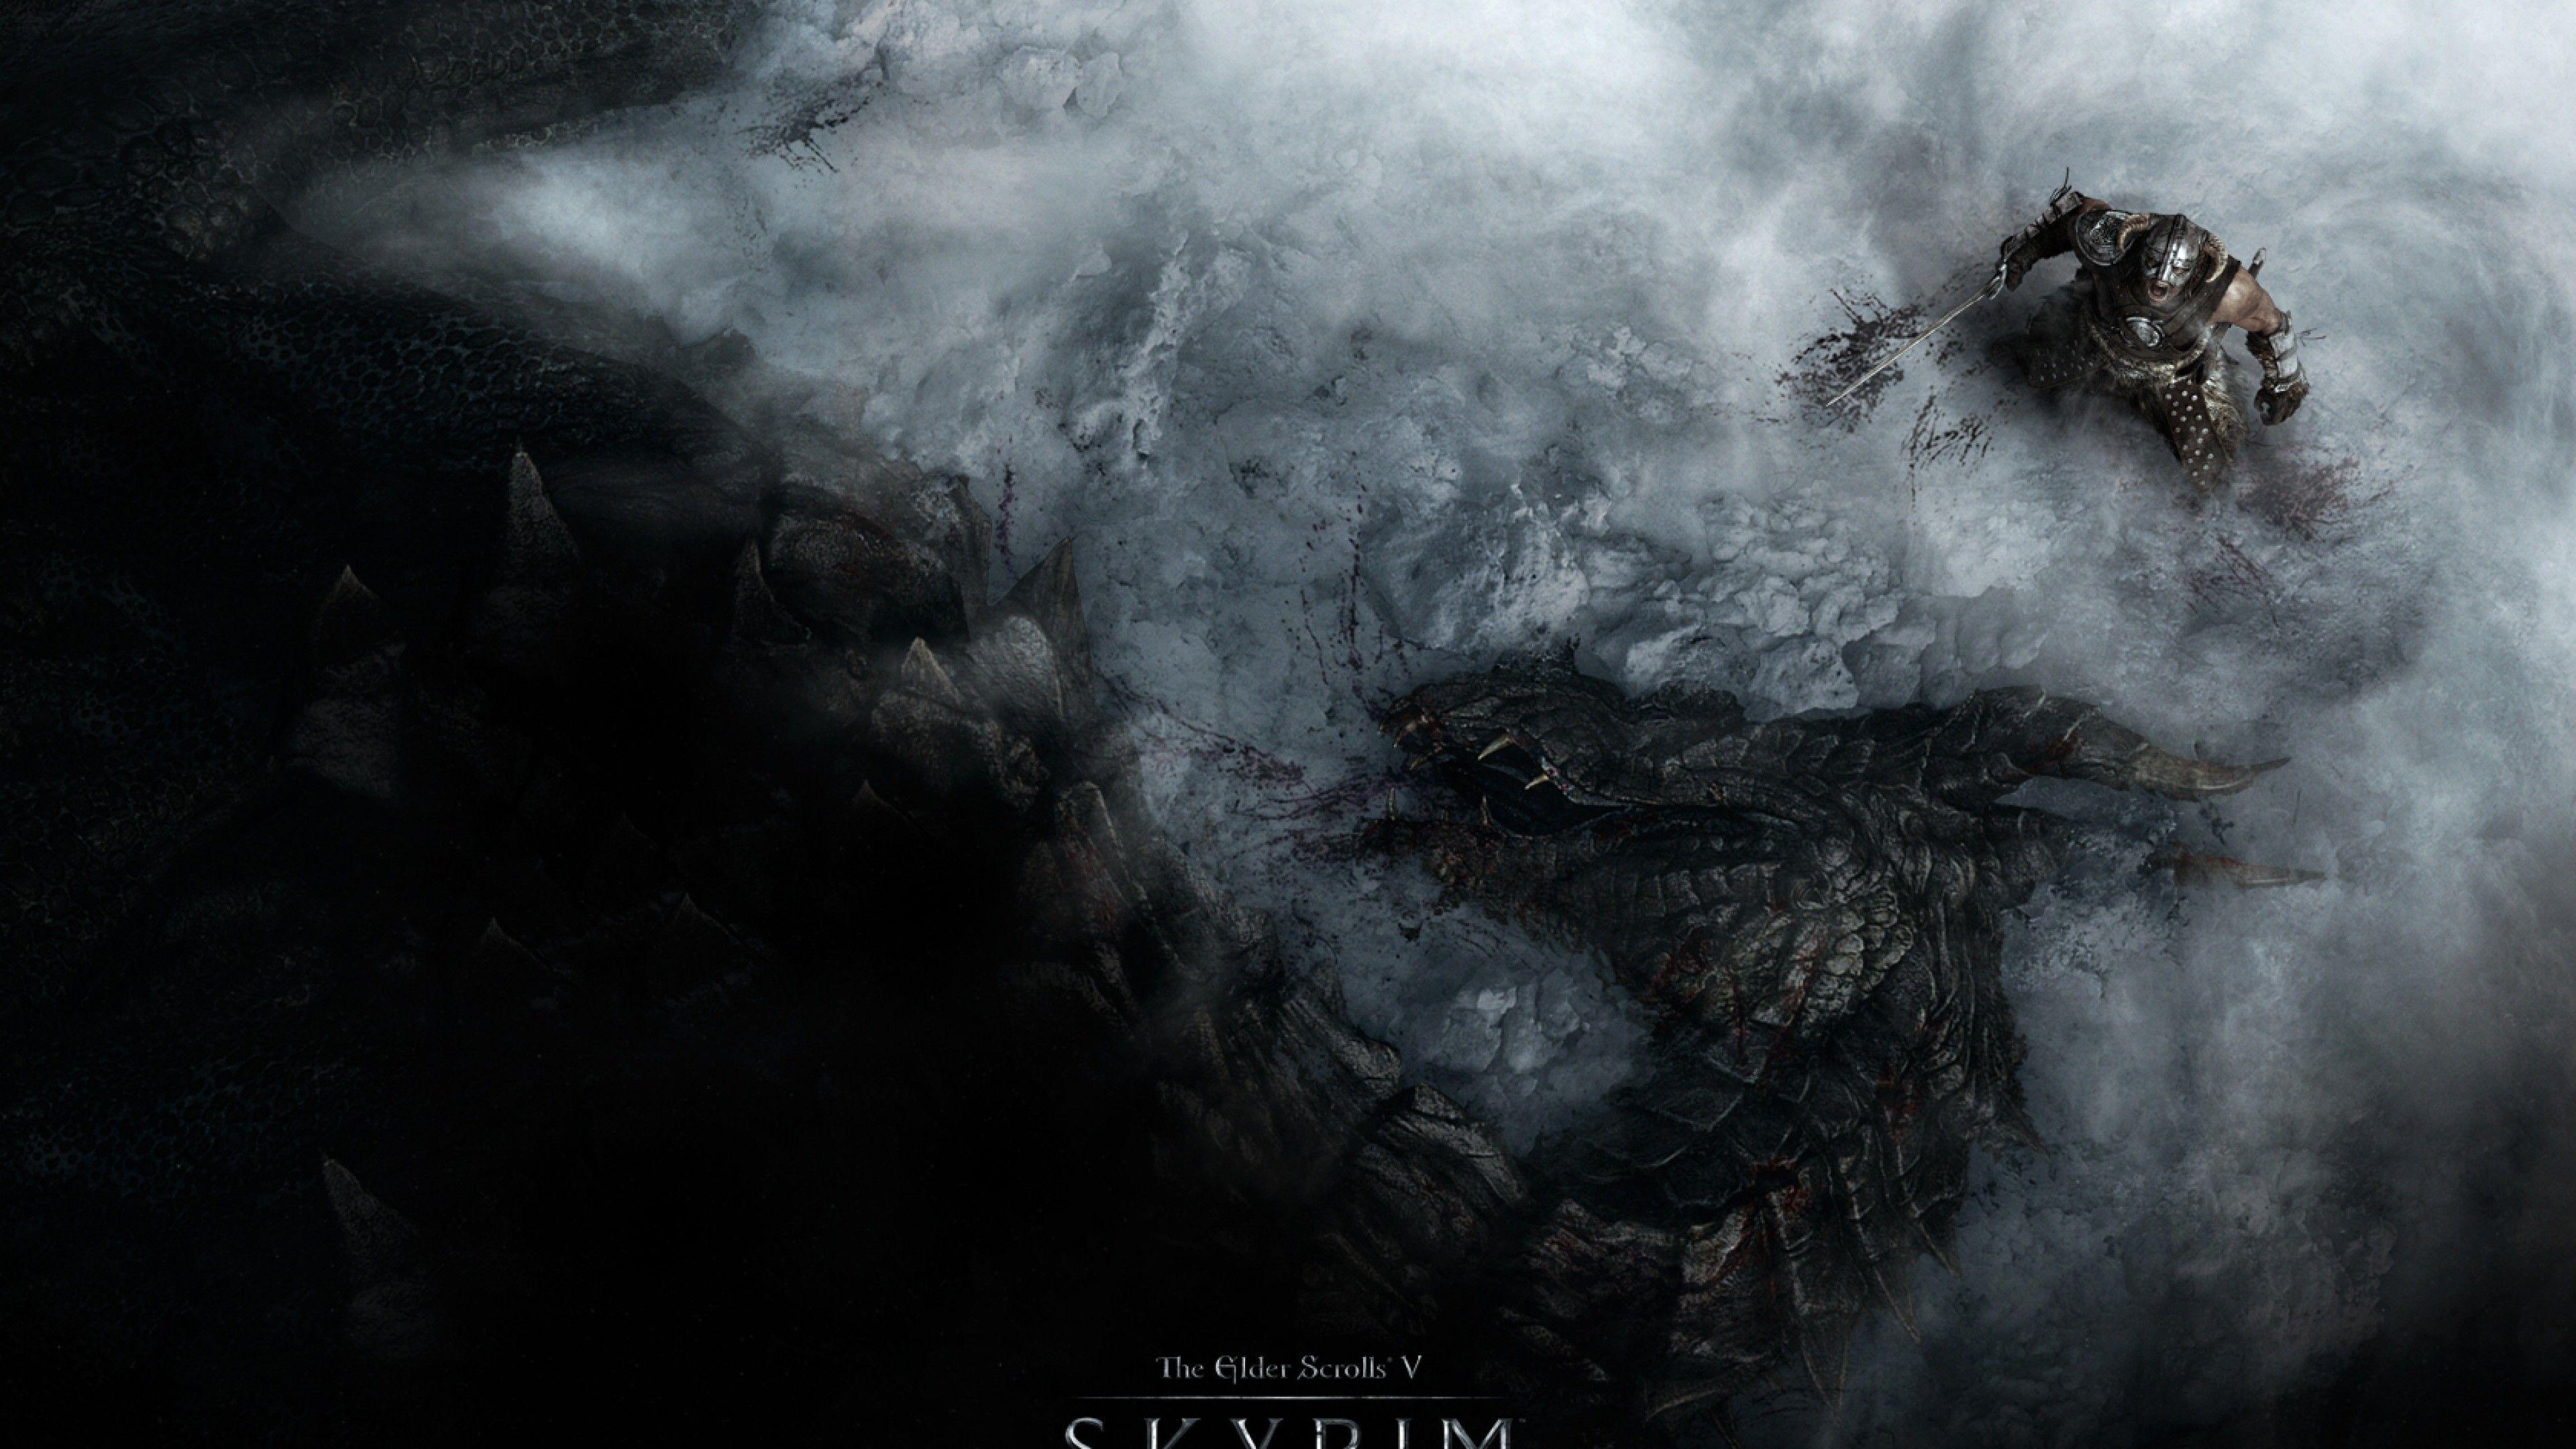 Res 3840x2160 Herunterladen Skyrim Wallpaper Skyrim Elder Scrolls Skyrim